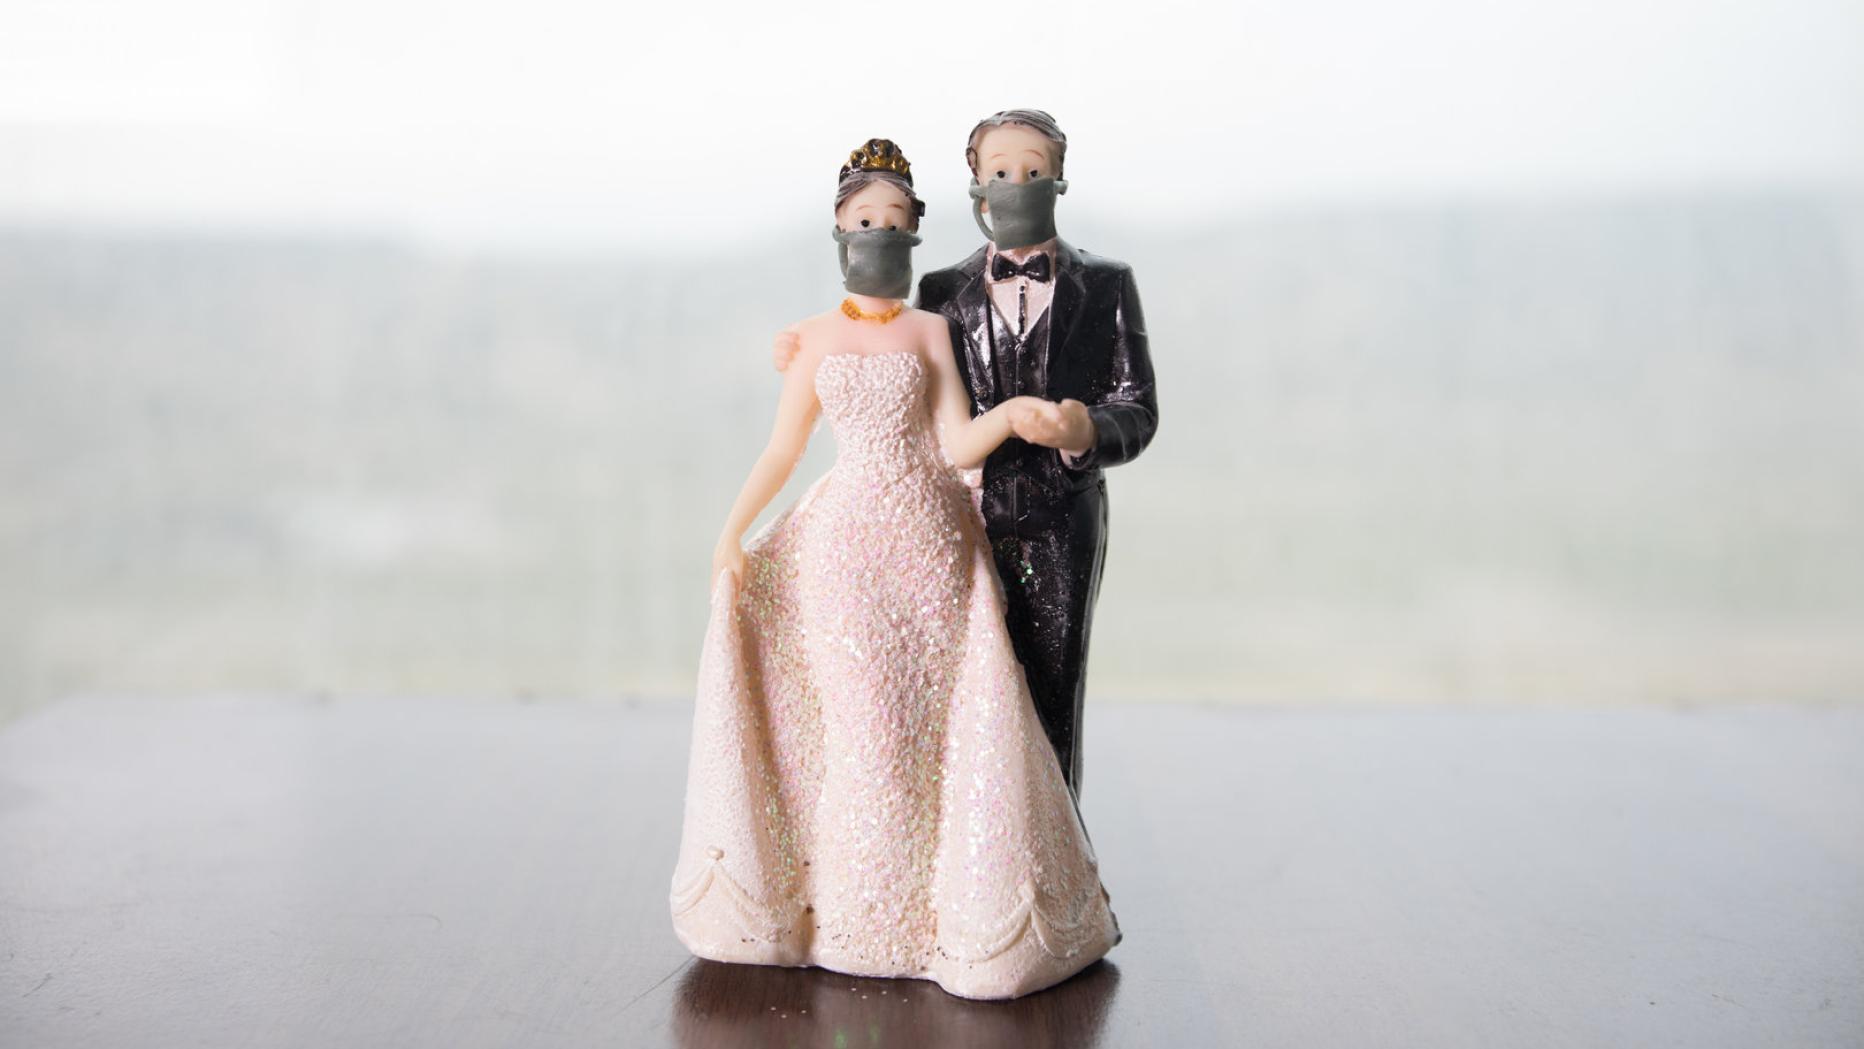 Hochzeiten 2021 Verliebt Verlobt Verschoben Kurier At